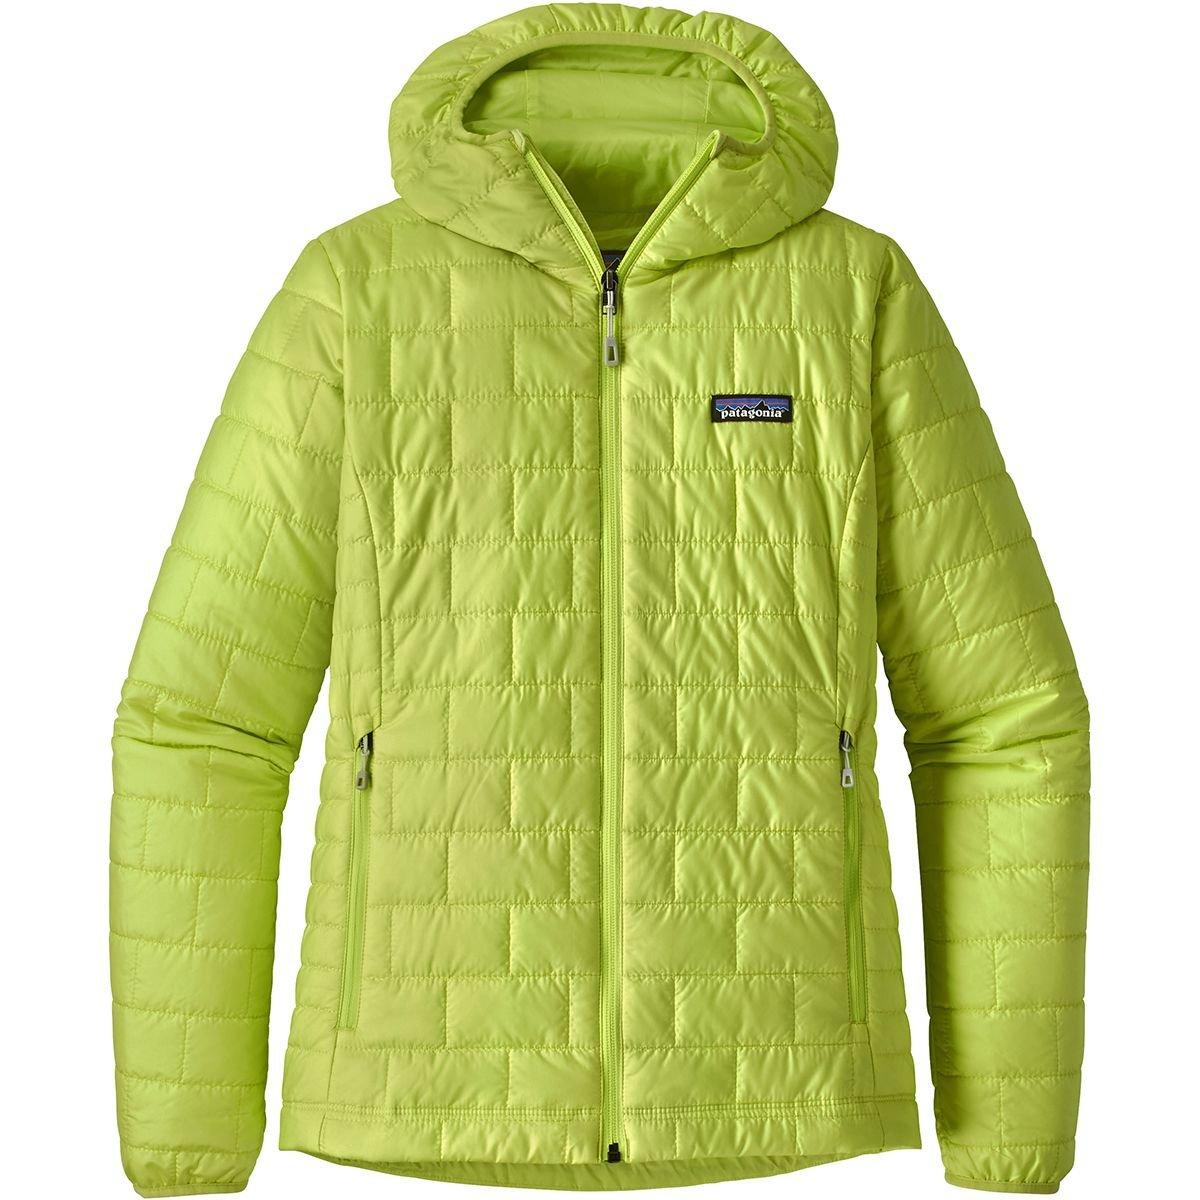 Patagonia パタゴニア W's Nano Puff Hoody レディース ジャケット 防寒 (BLK):84227 B079K4891G X-Small|Celery Green Celery Green X-Small